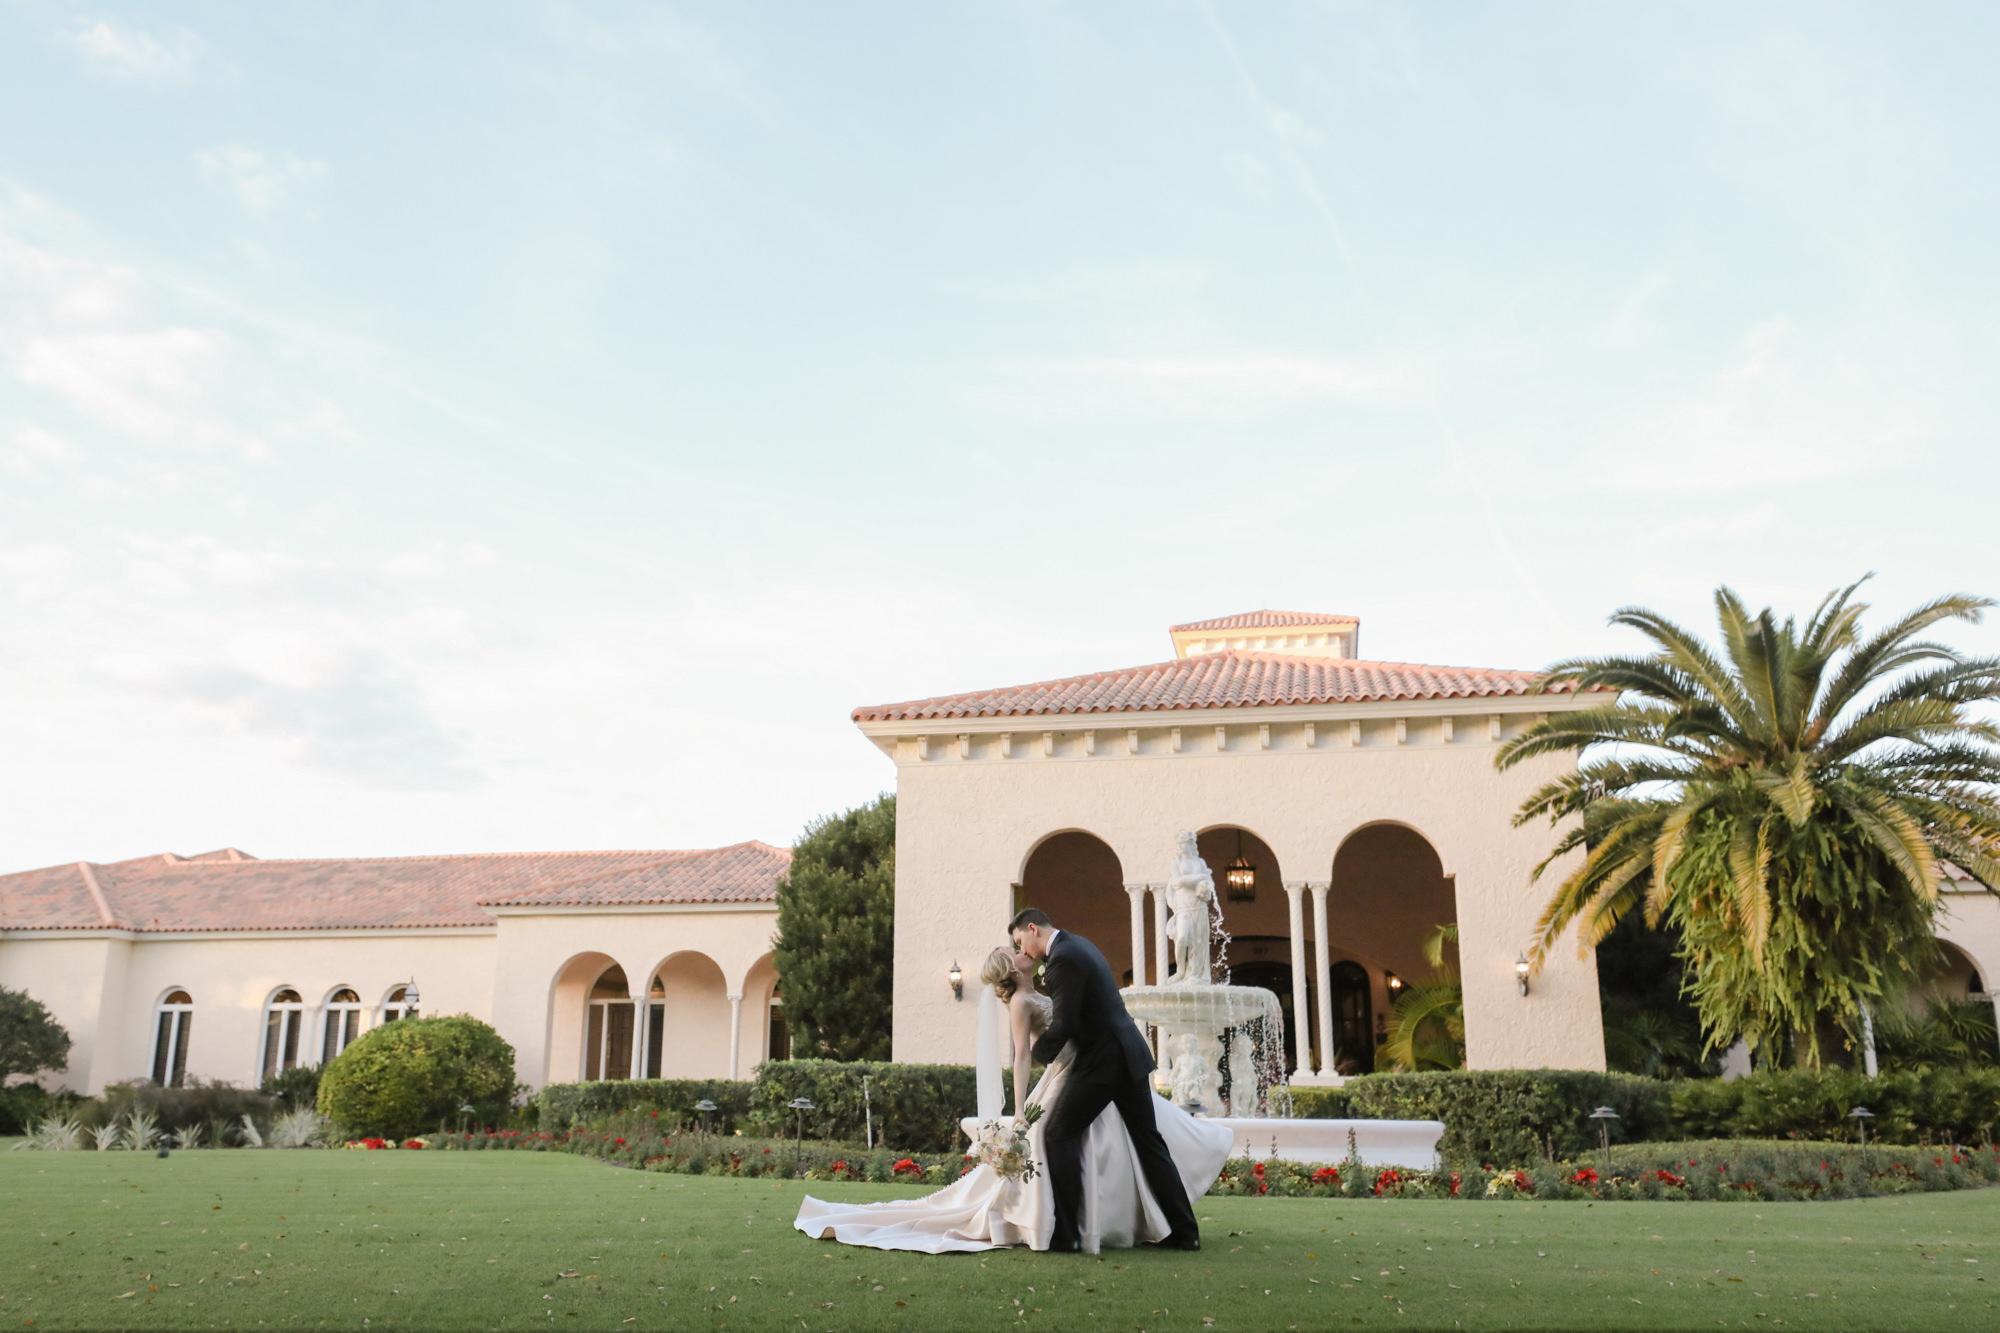 Tampa Wedding Venue Avila Golf & Country Club | Bride and Groom Outdoor Fountain Portrait | Tampa Bay Wedding Photographer Lifelong Photography Studio